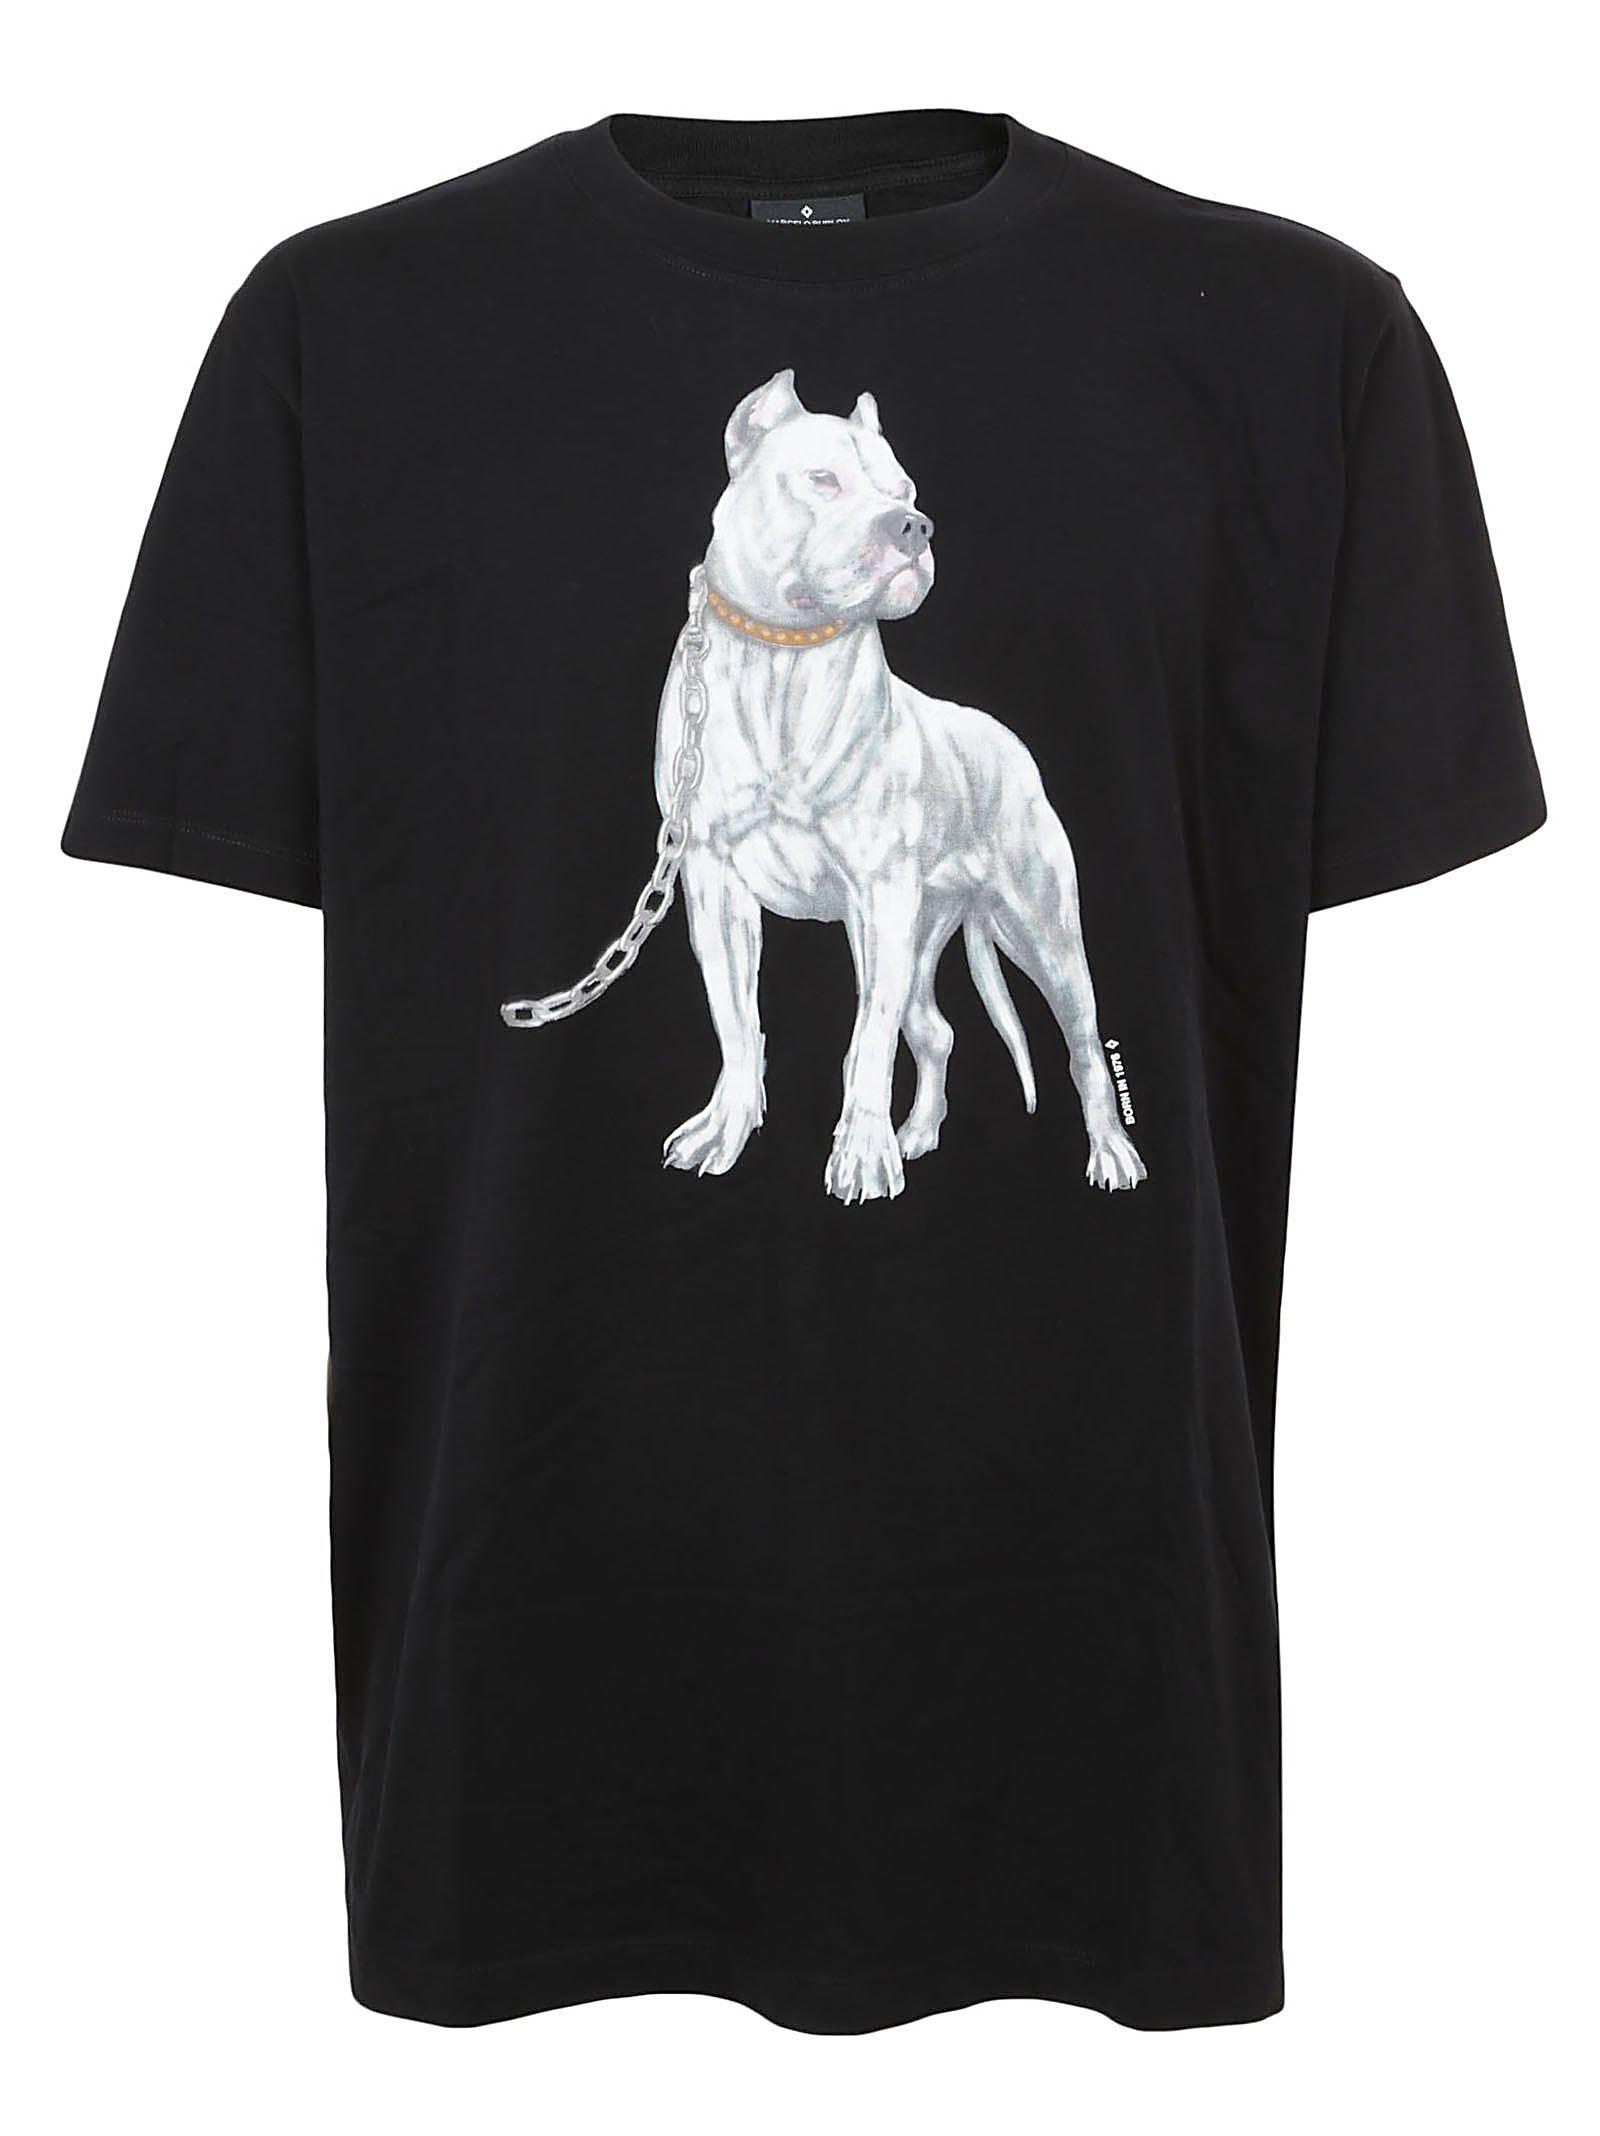 Marcelo Burlon County Of Milan Bulldog Print T-Shirt In Black Multicolor aab4c630921b